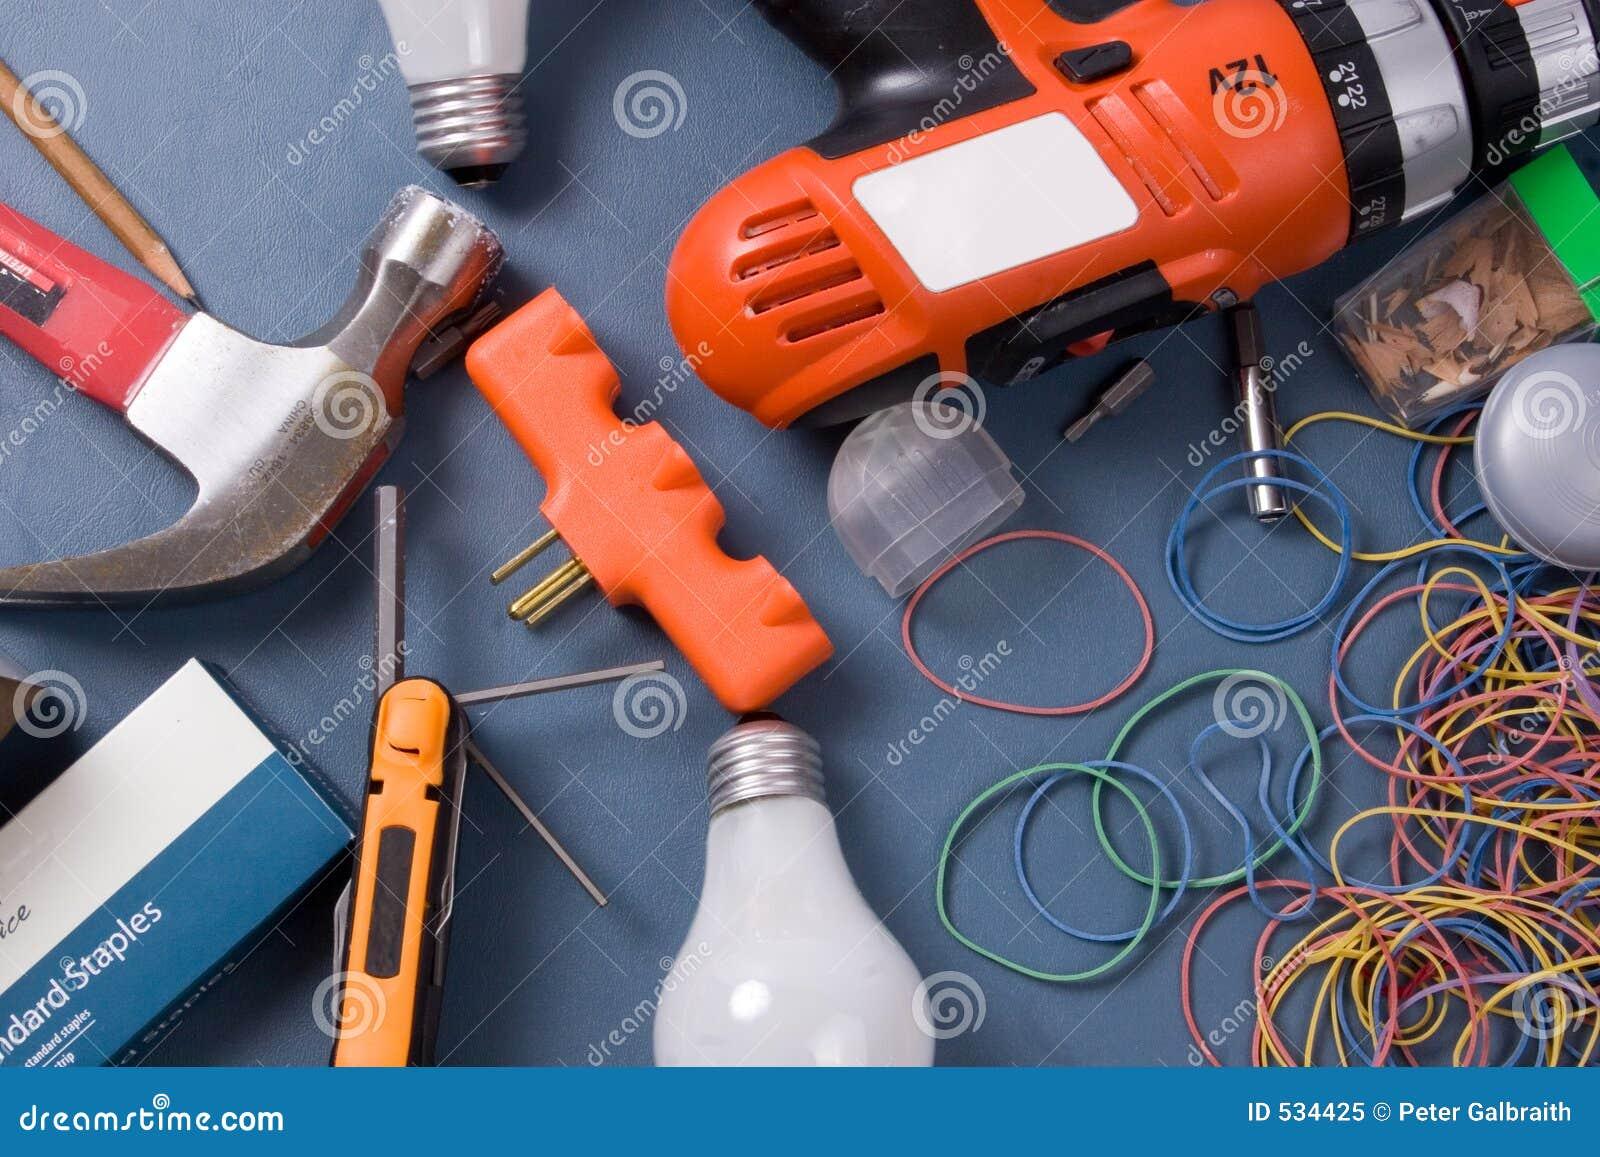 Download 家庭东西 库存图片. 图片 包括有 螺丝刀, 锤子, 铅笔, 驱动器, 创建, 查询, 橡胶, 维修服务, 抽象 - 534425